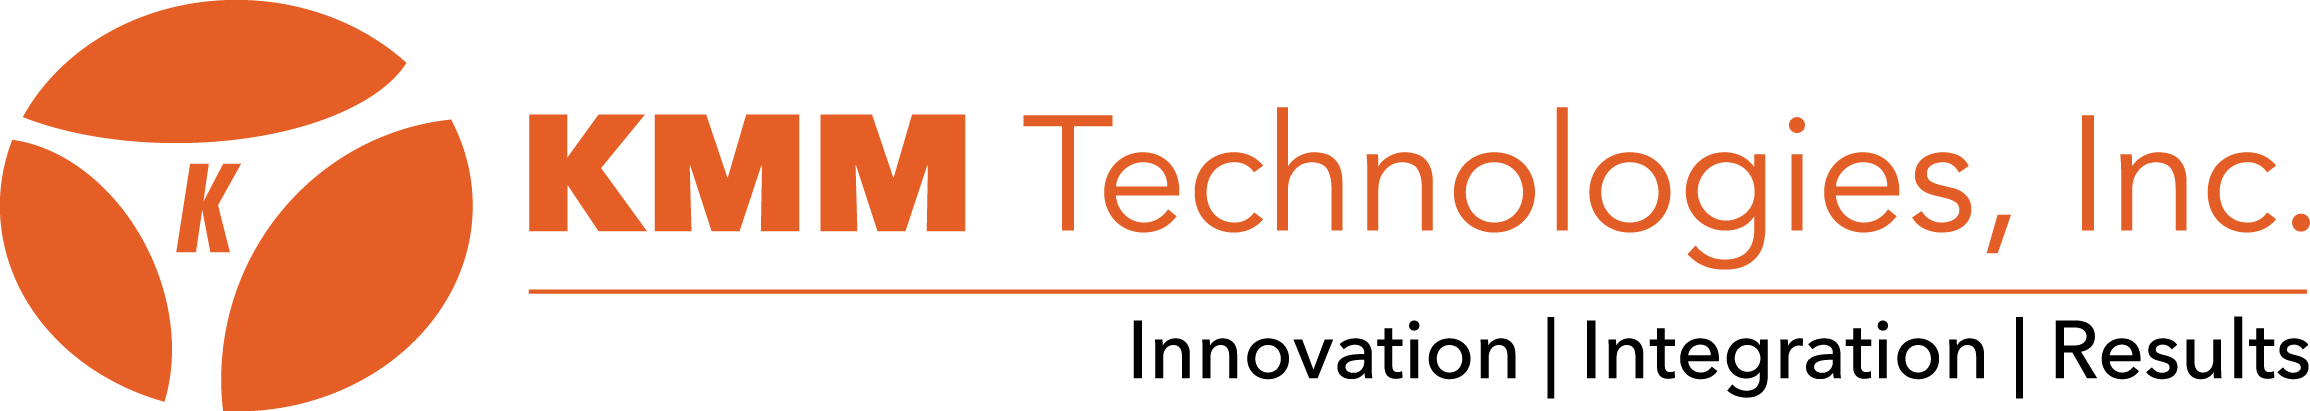 Company Logo KMM Technologies, Inc.